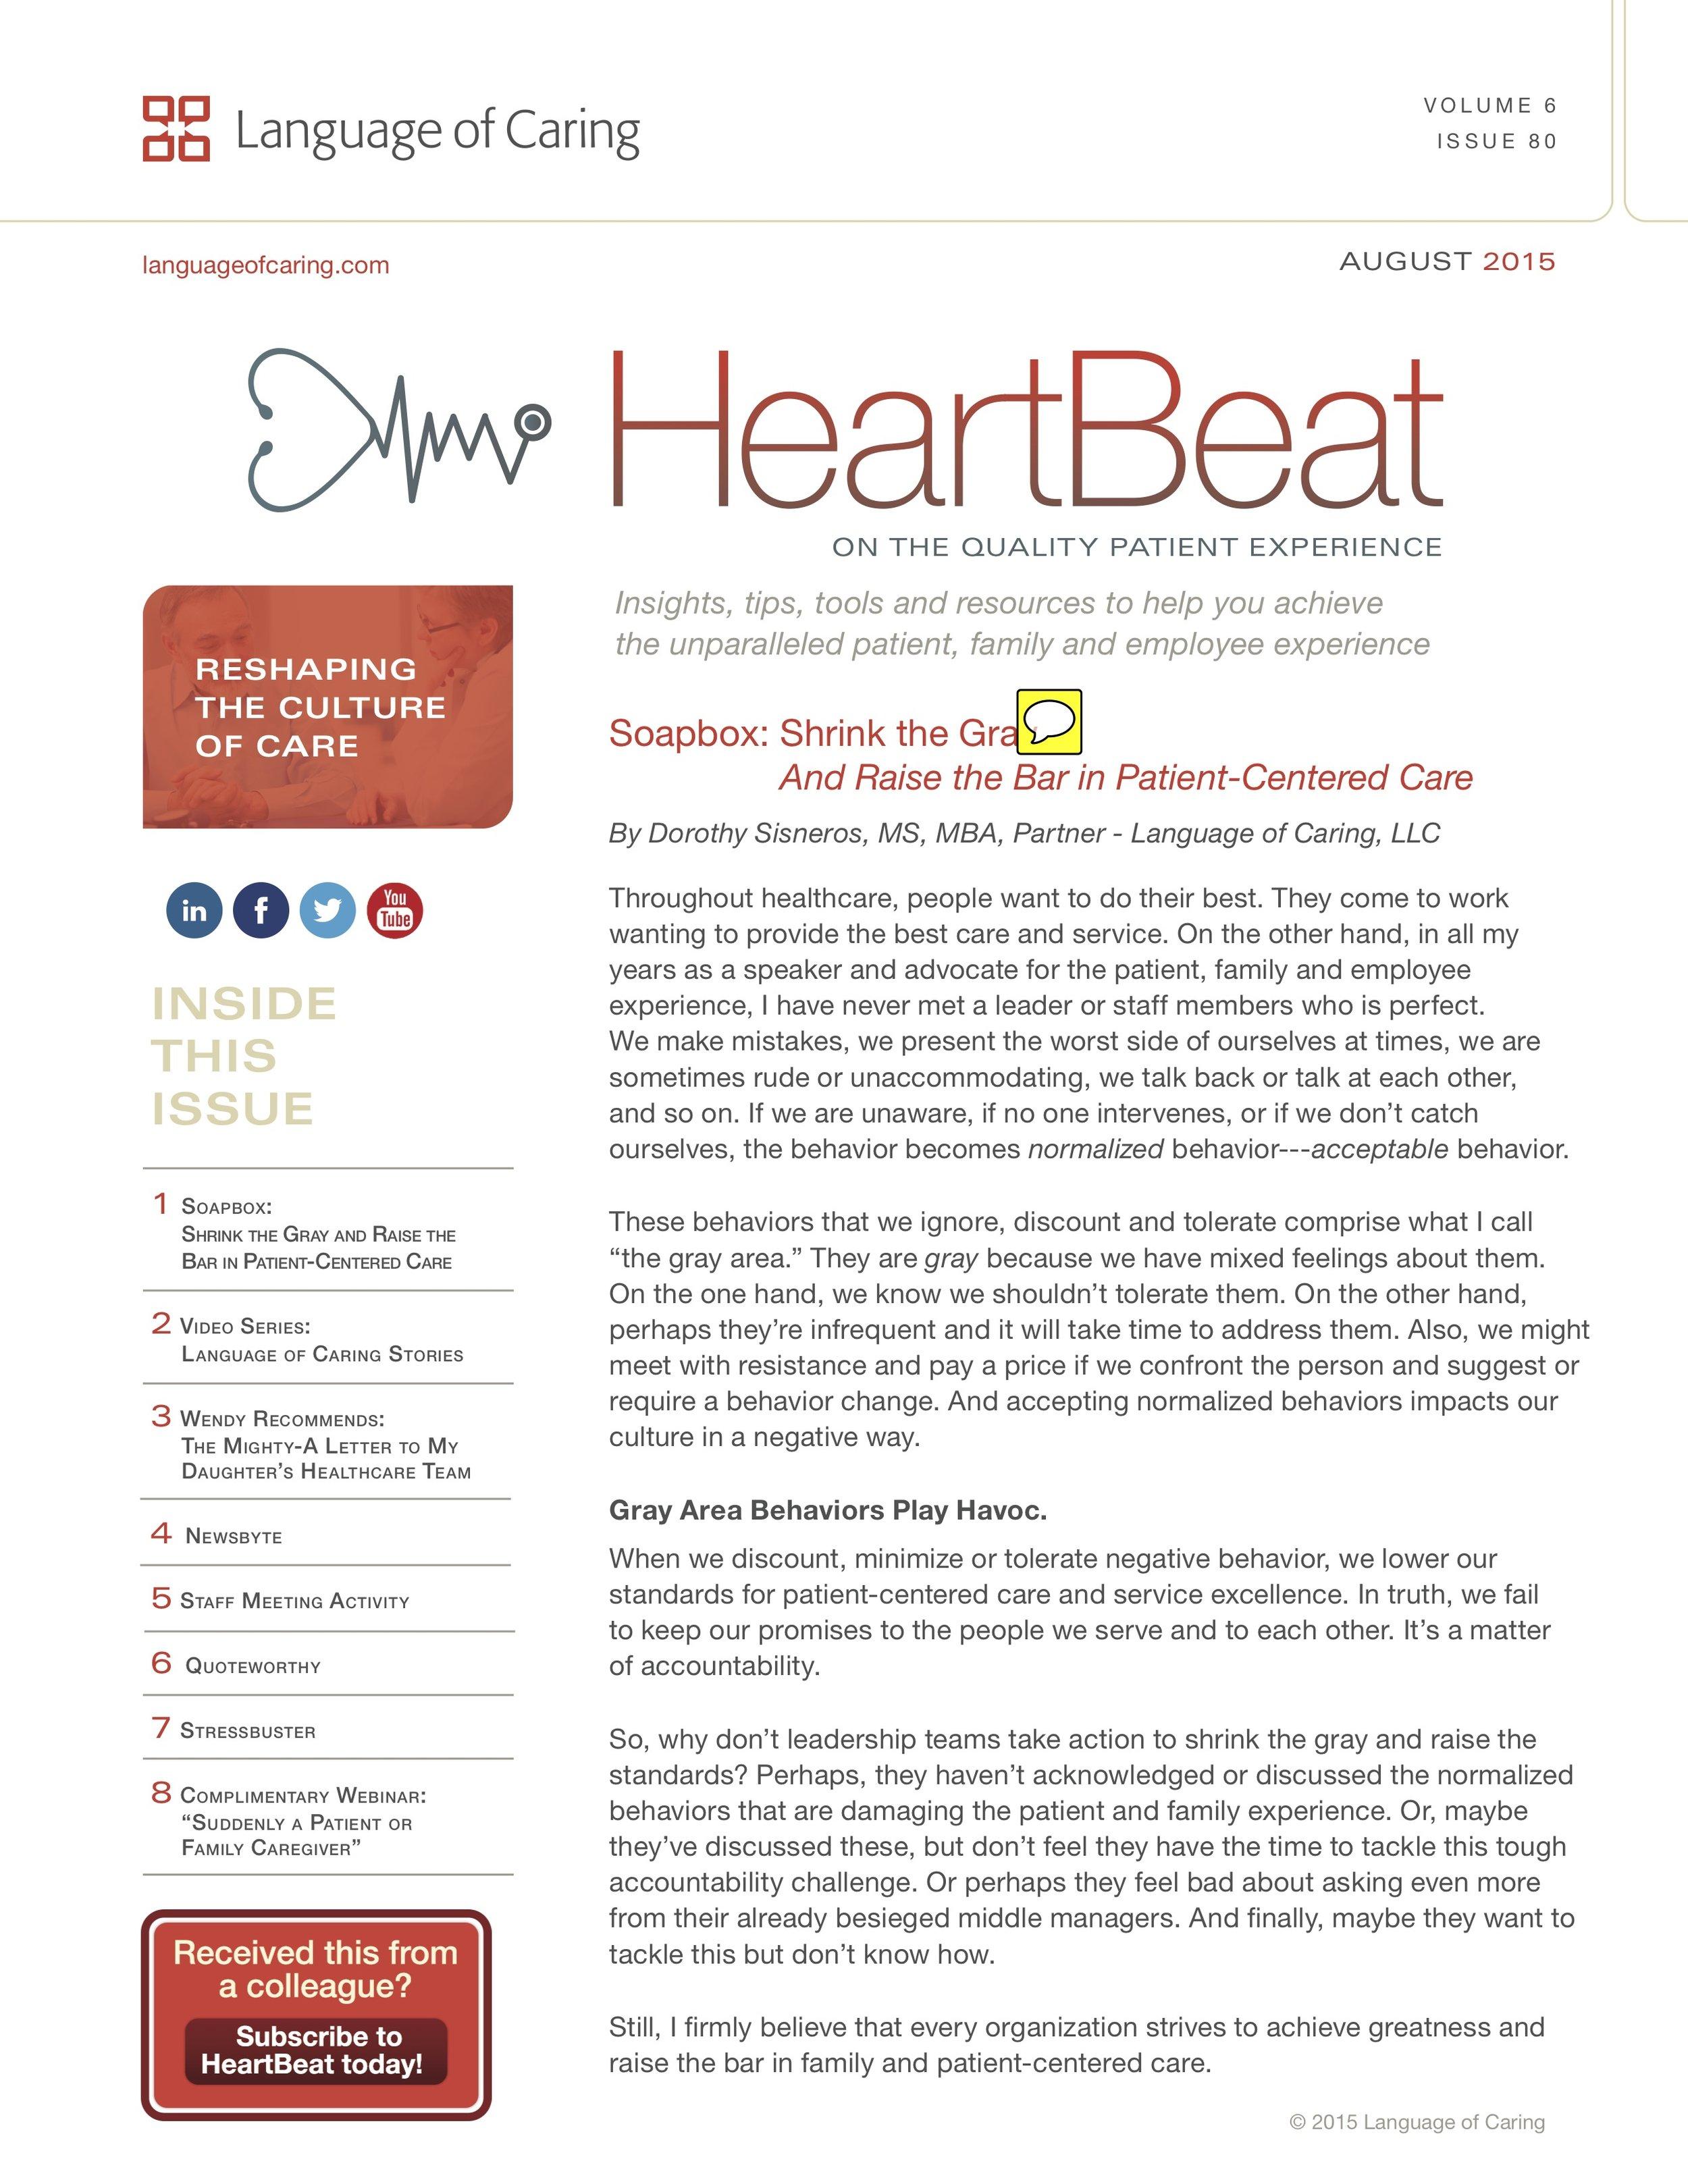 heartbeat_aug_7_26_15.jpg